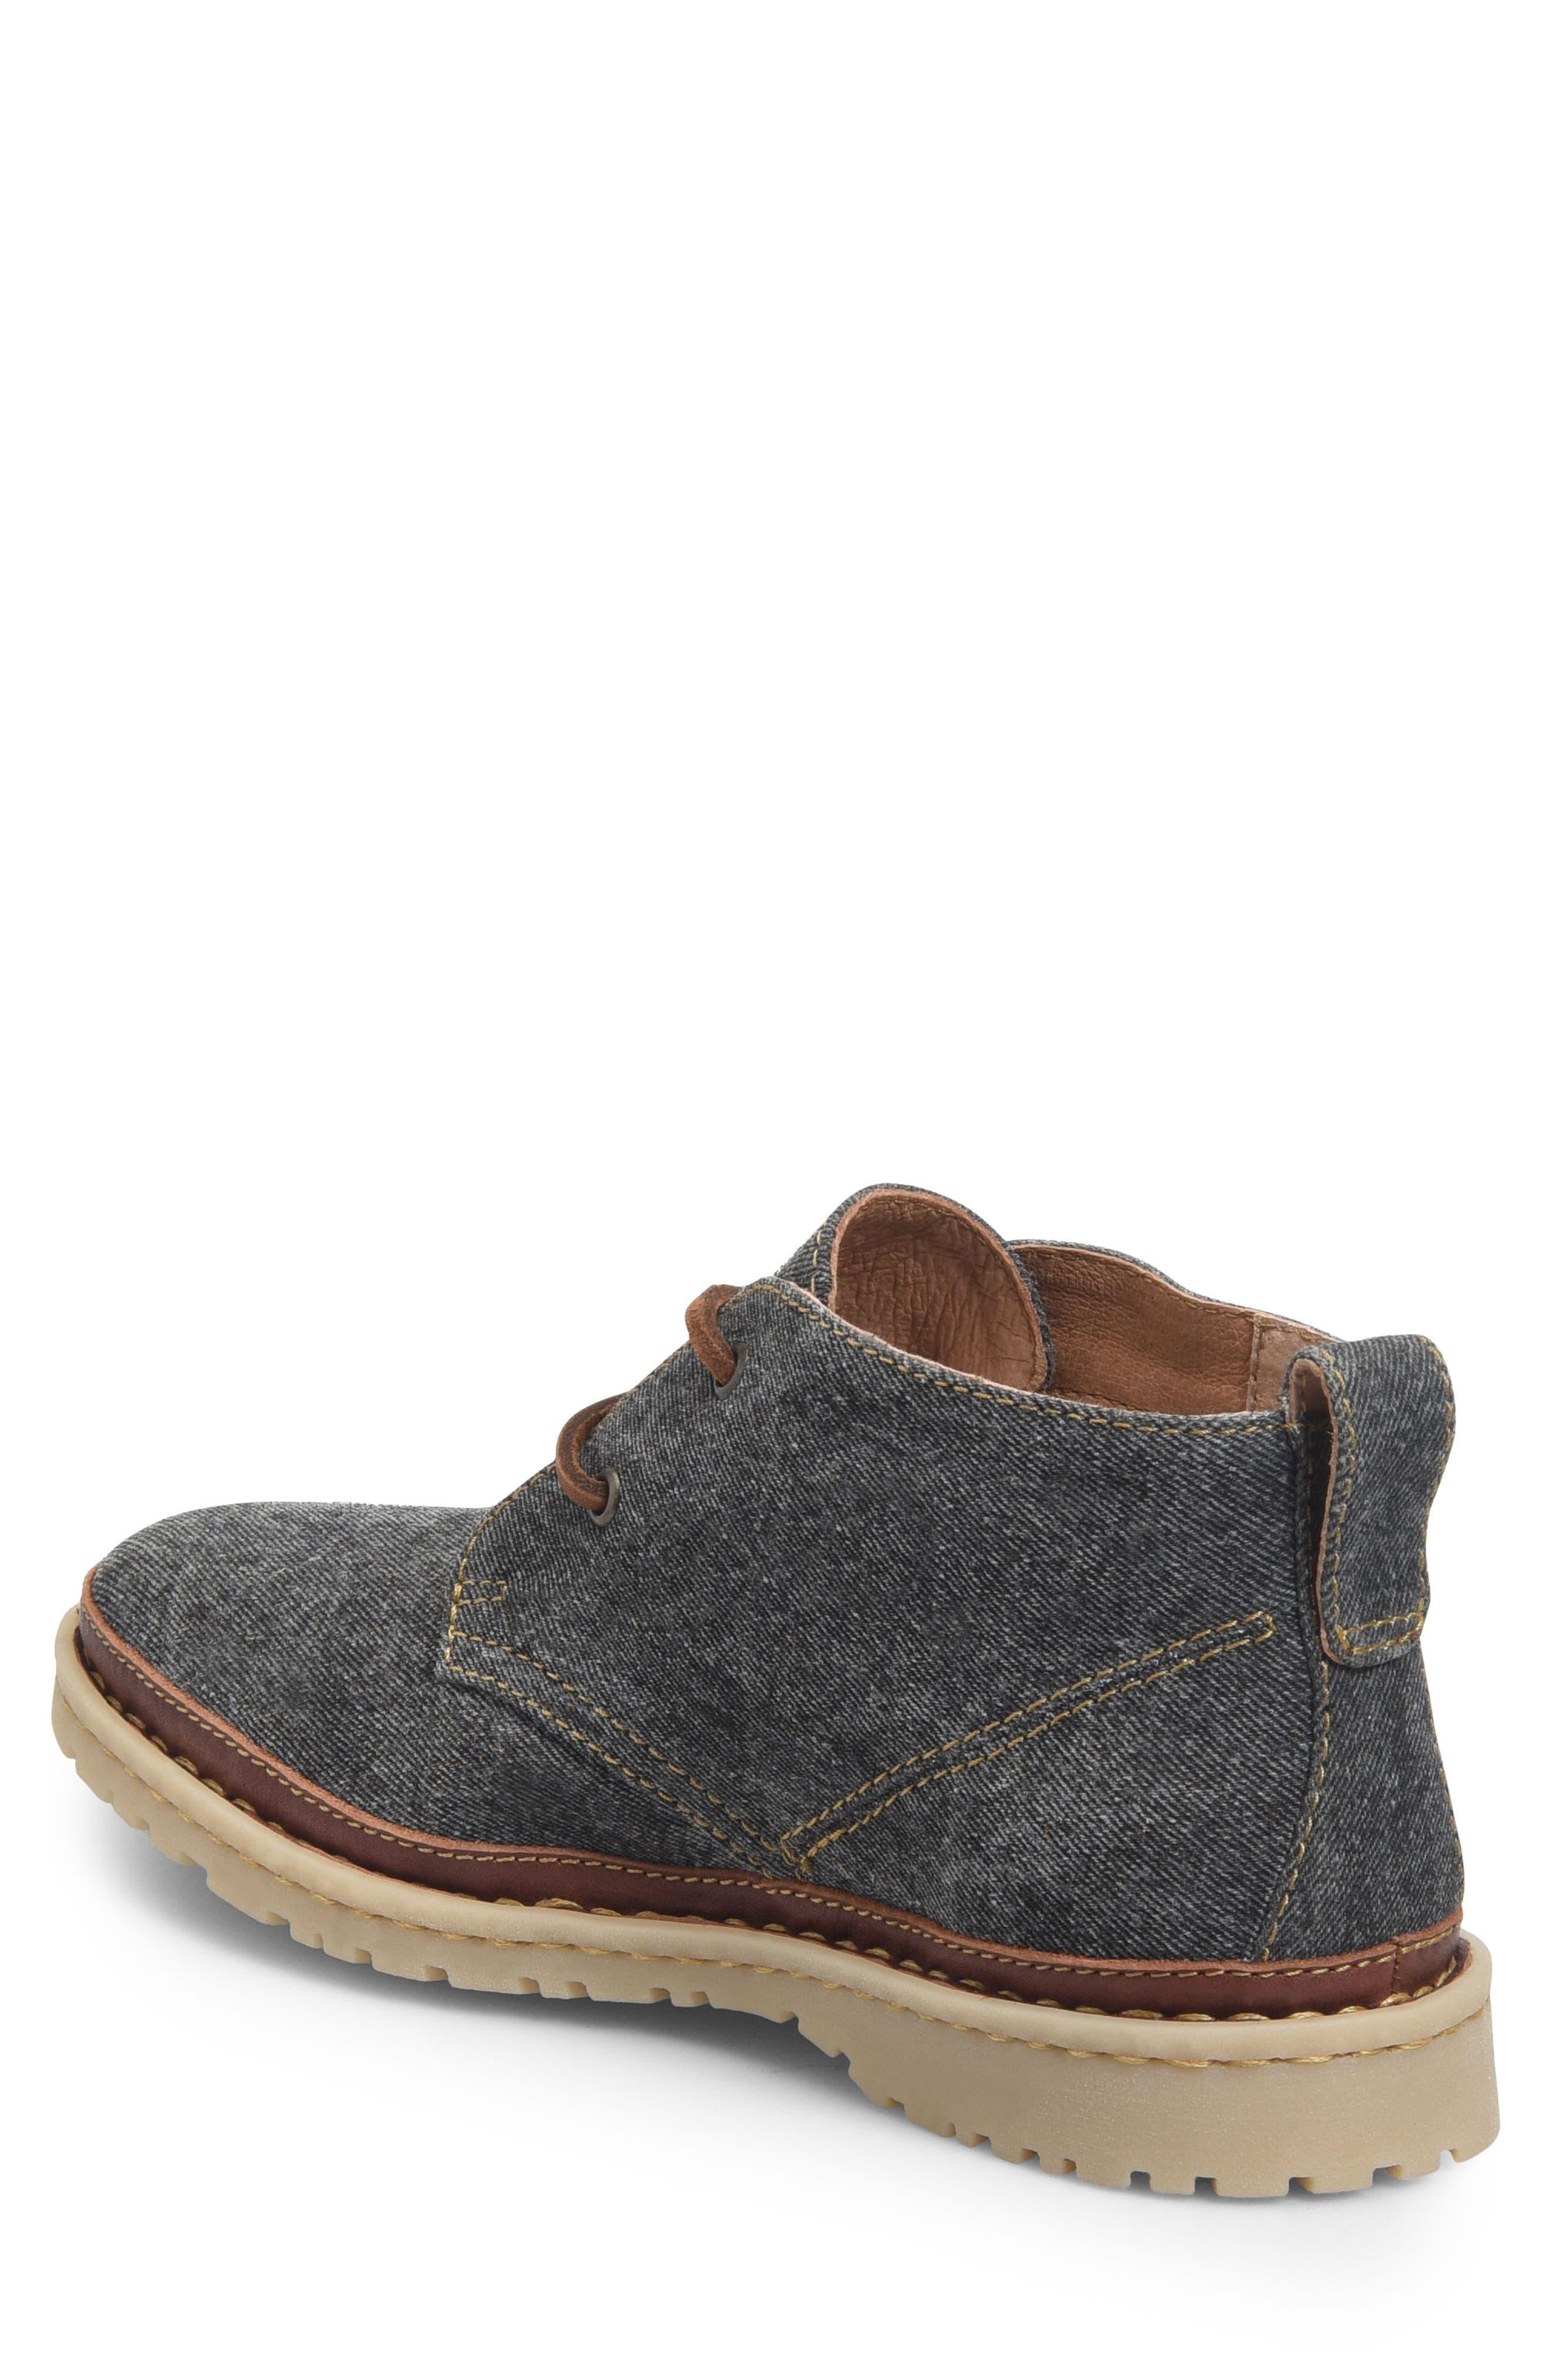 Elk II Chukka Boot,                             Alternate thumbnail 2, color,                             Dark Grey Fabric